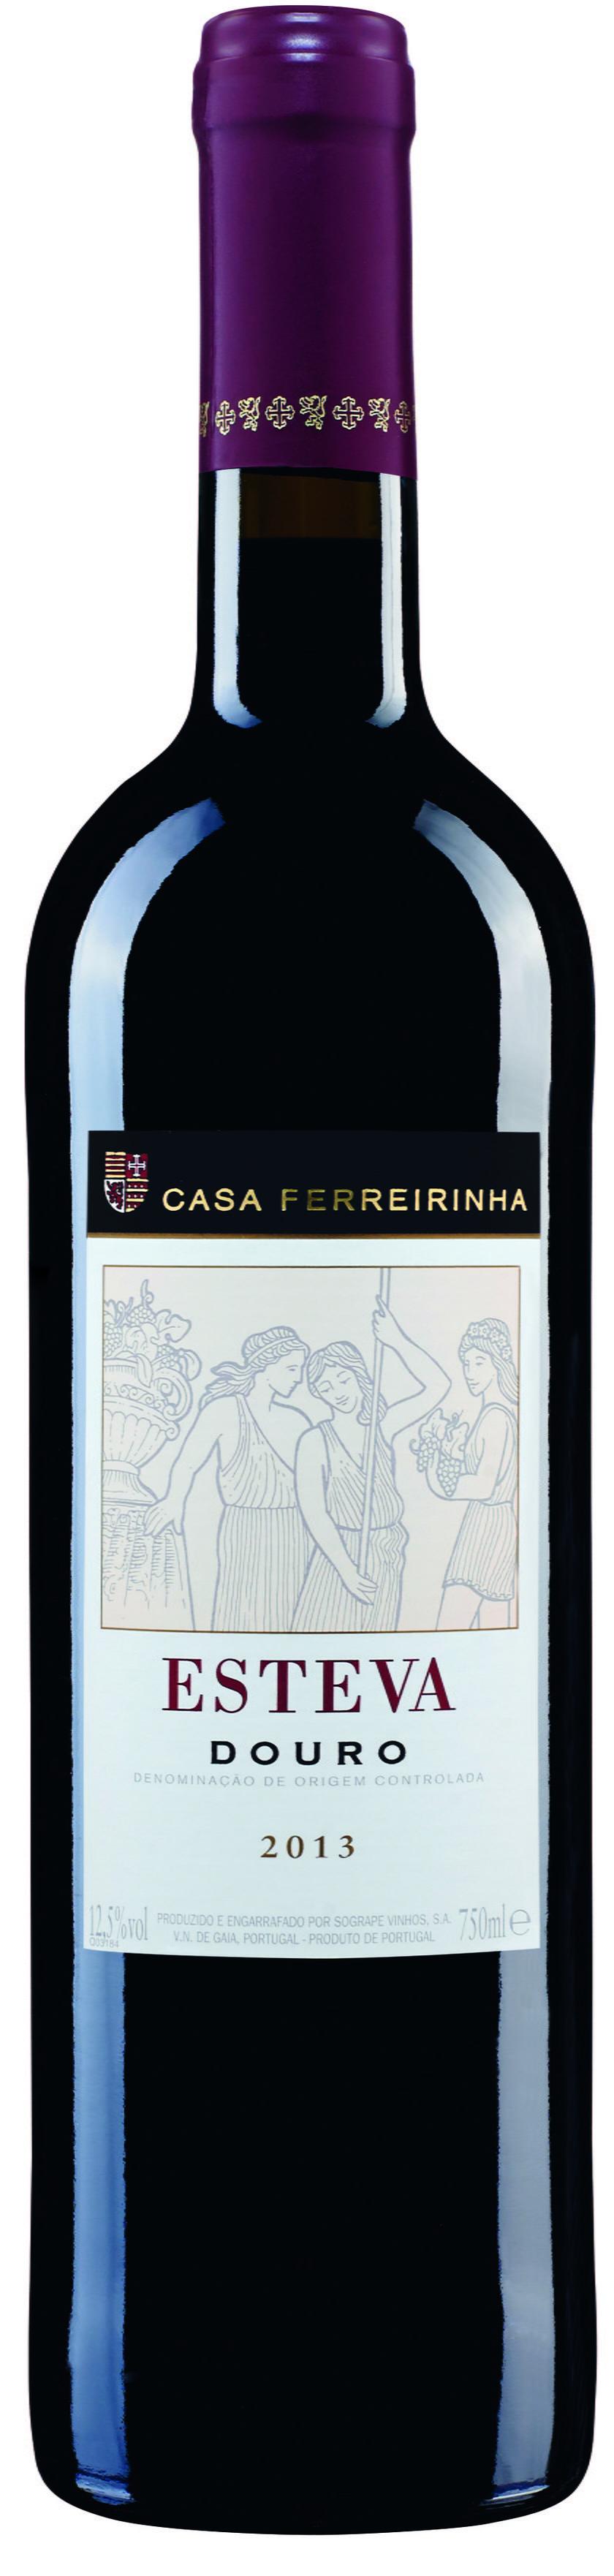 Portugalskie wina z Biedronki